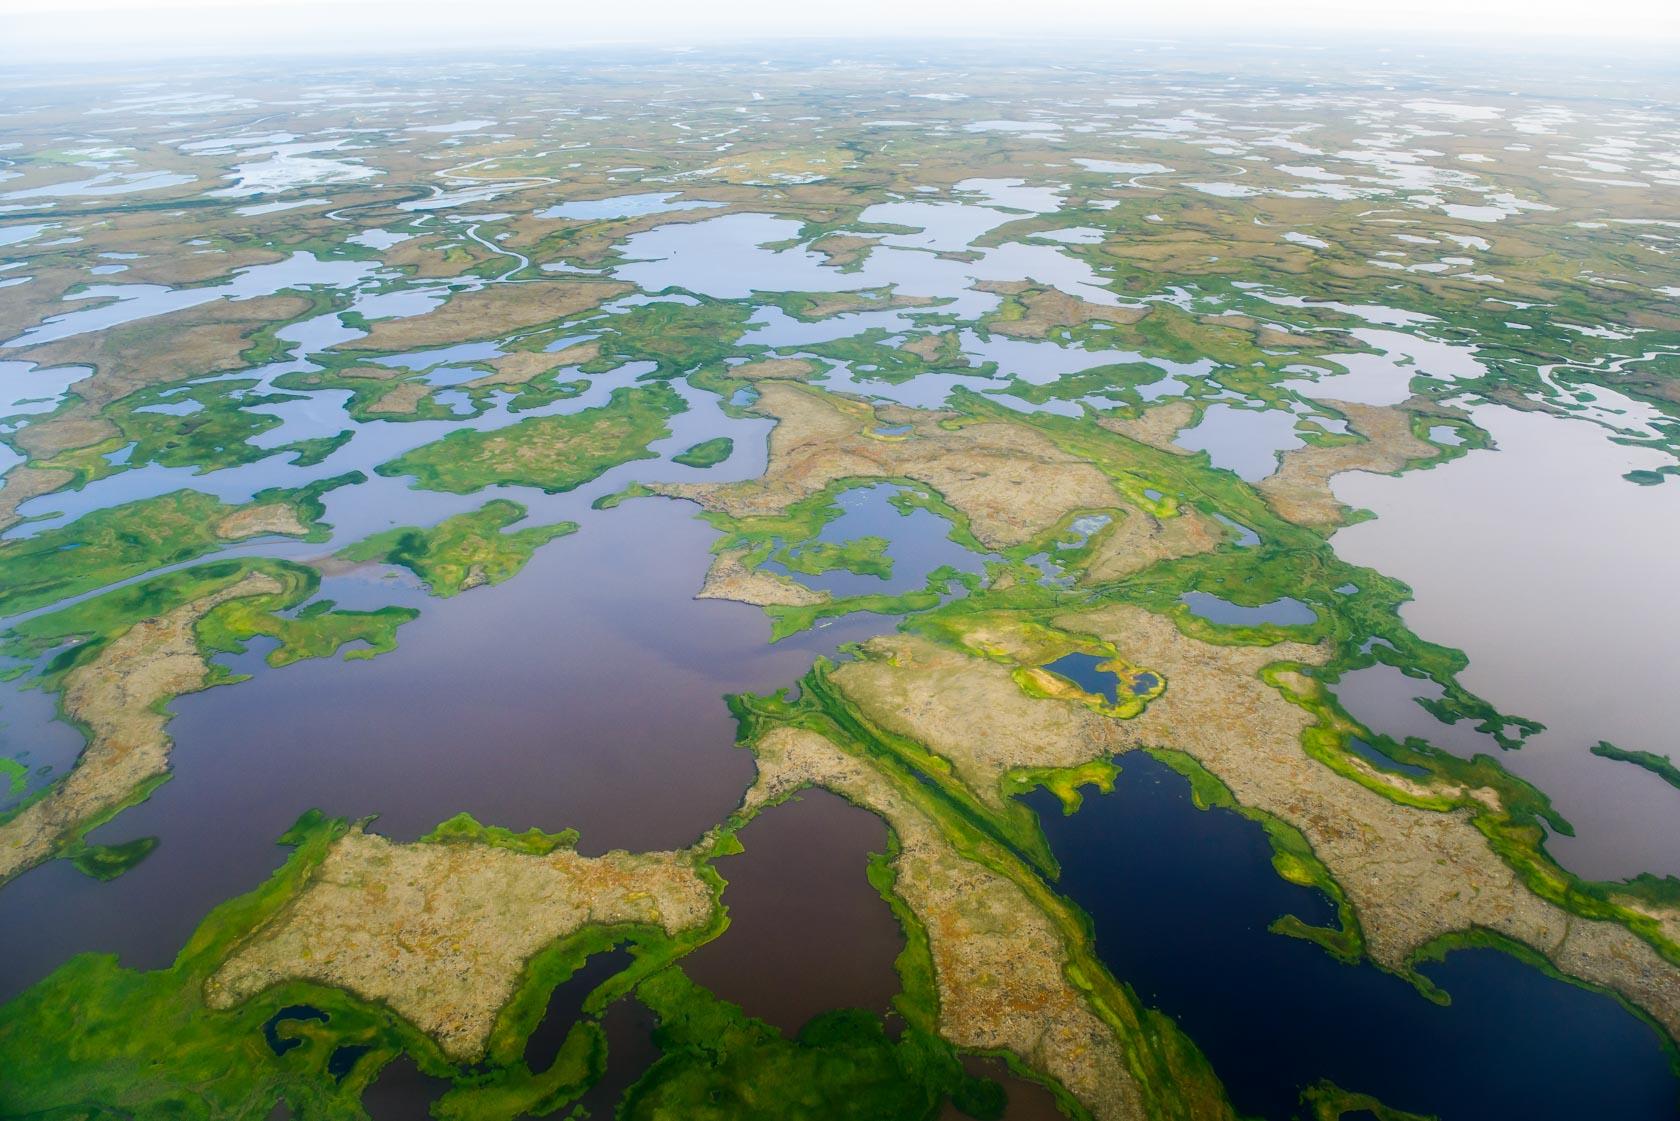 Aerial, Yukon-Kuskokwim Delta